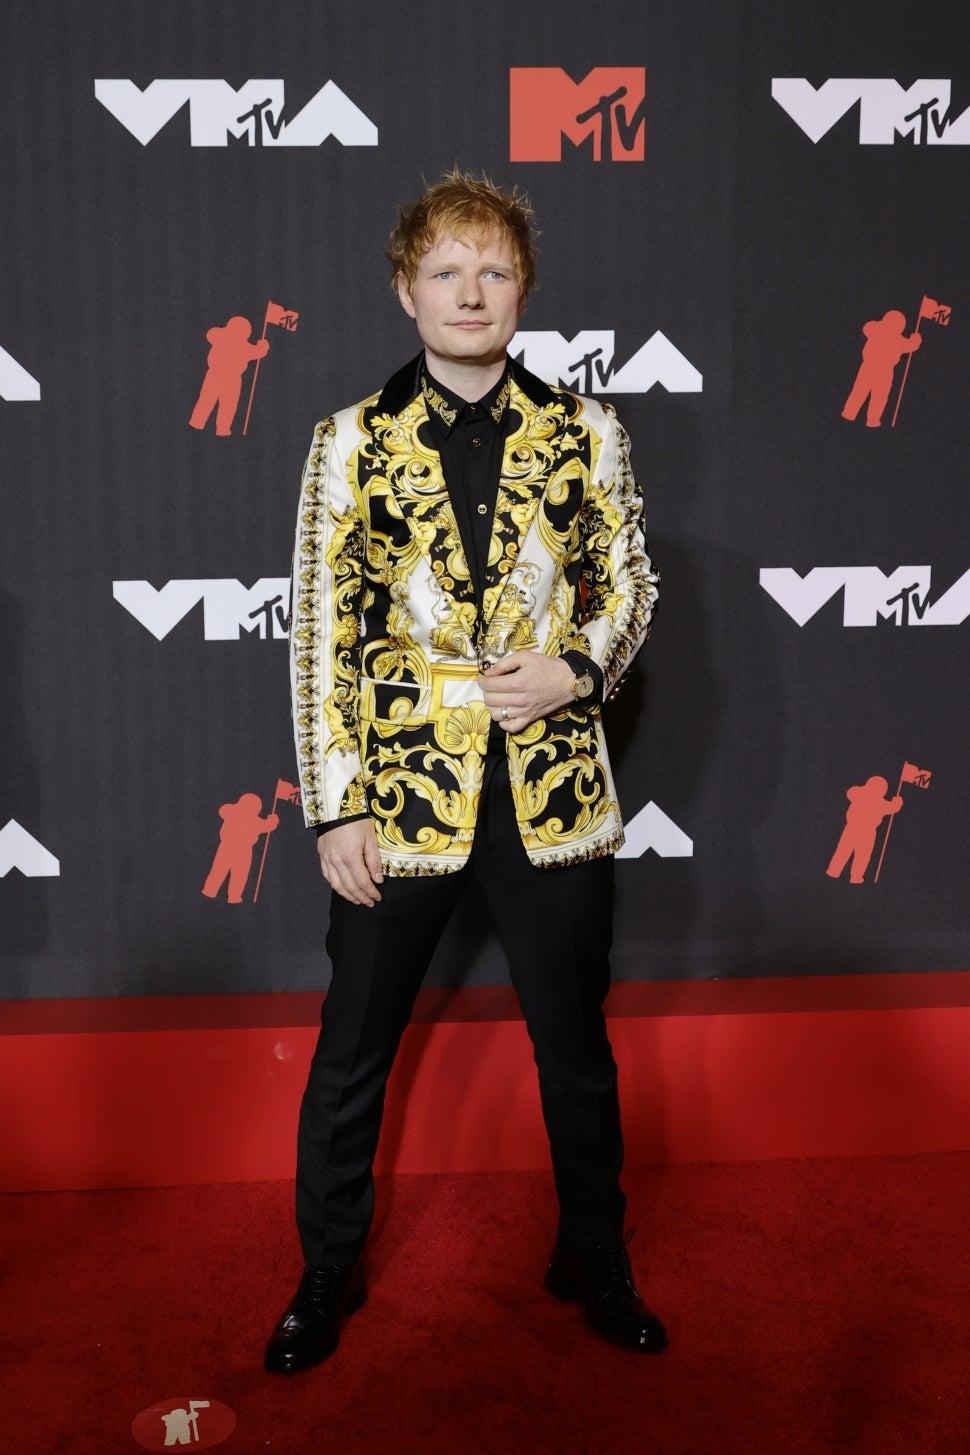 Ed Sheeran attends the 2021 MTV Video Music Awards